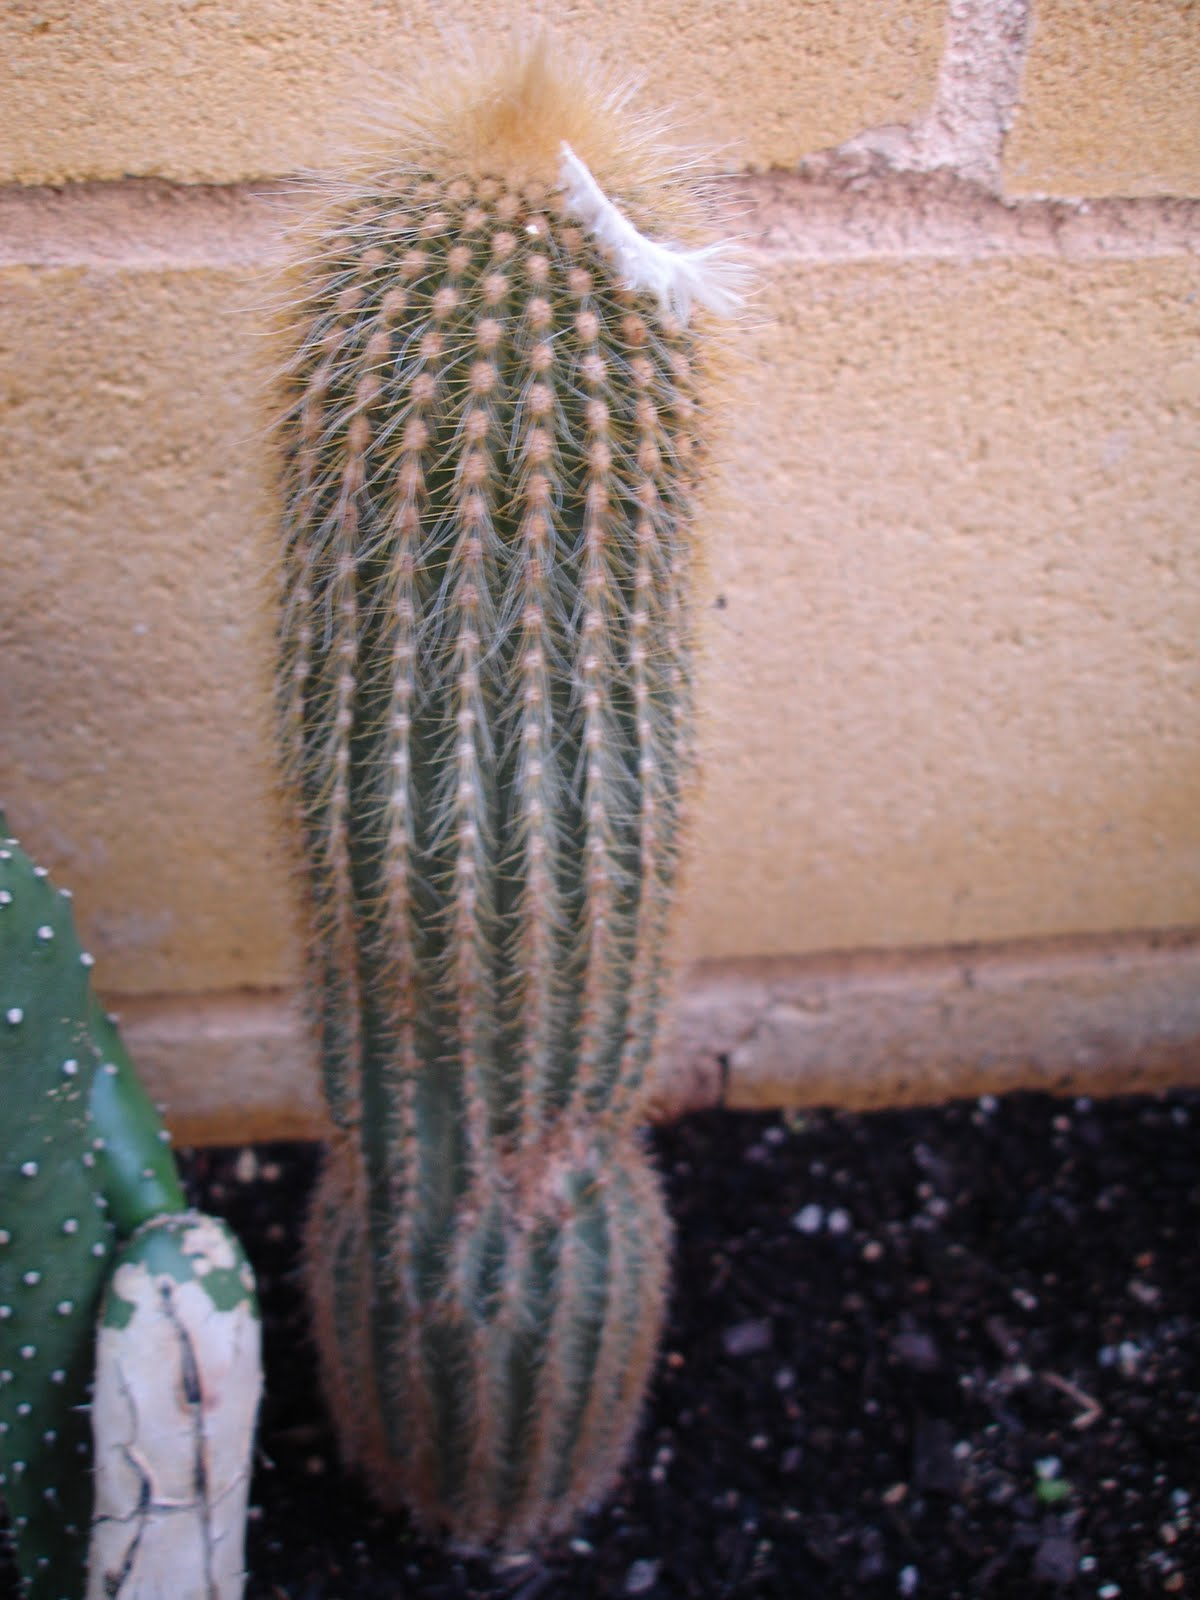 La casa de los cactus notocactus leninghausii for Donde venden cactus